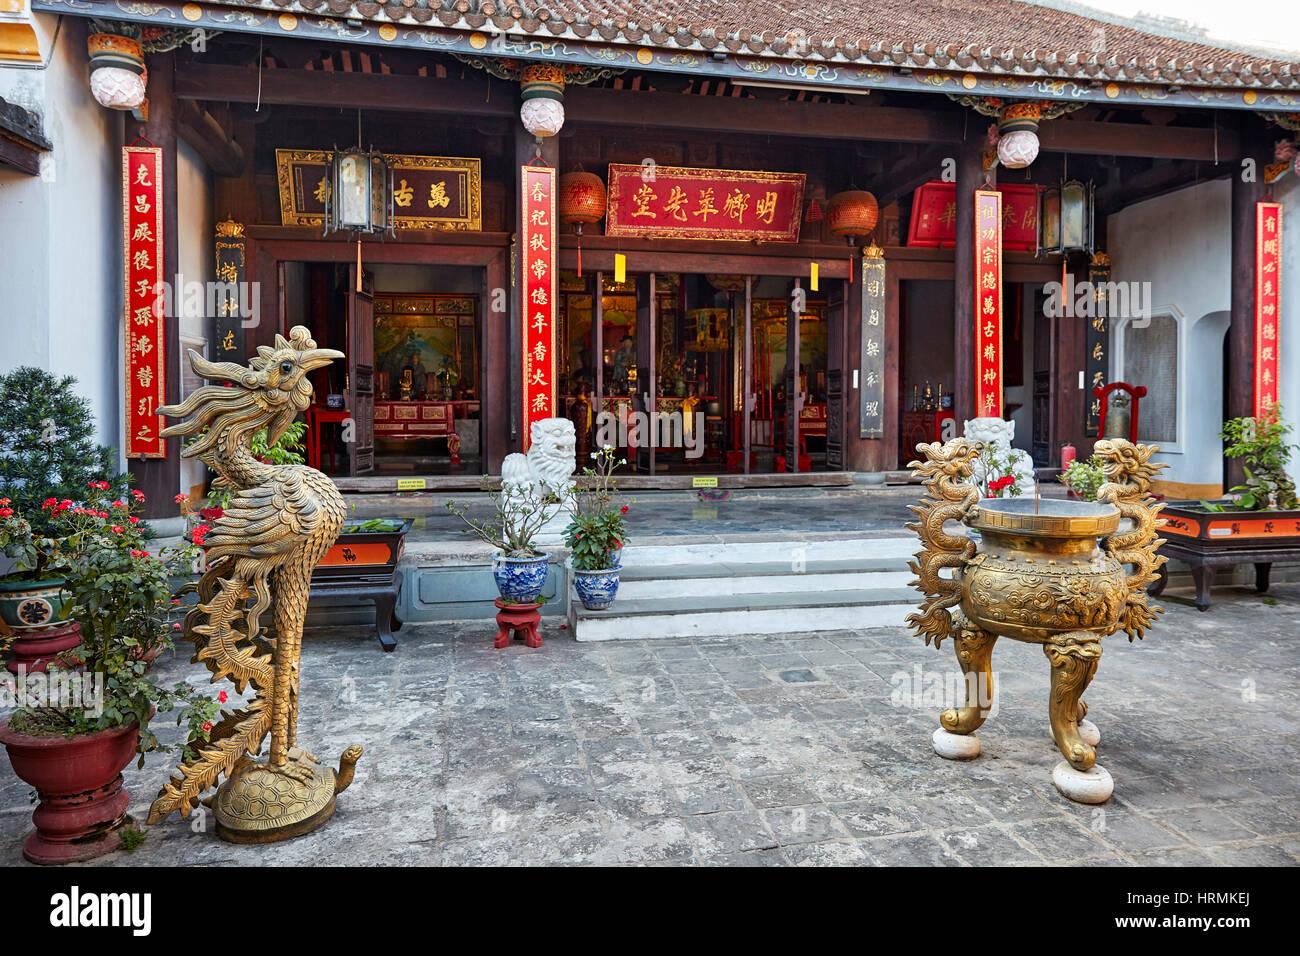 Minh Huong Communal House. Hoi An Ancient Town, Quang Nam Province, Vietnam. - Stock Image